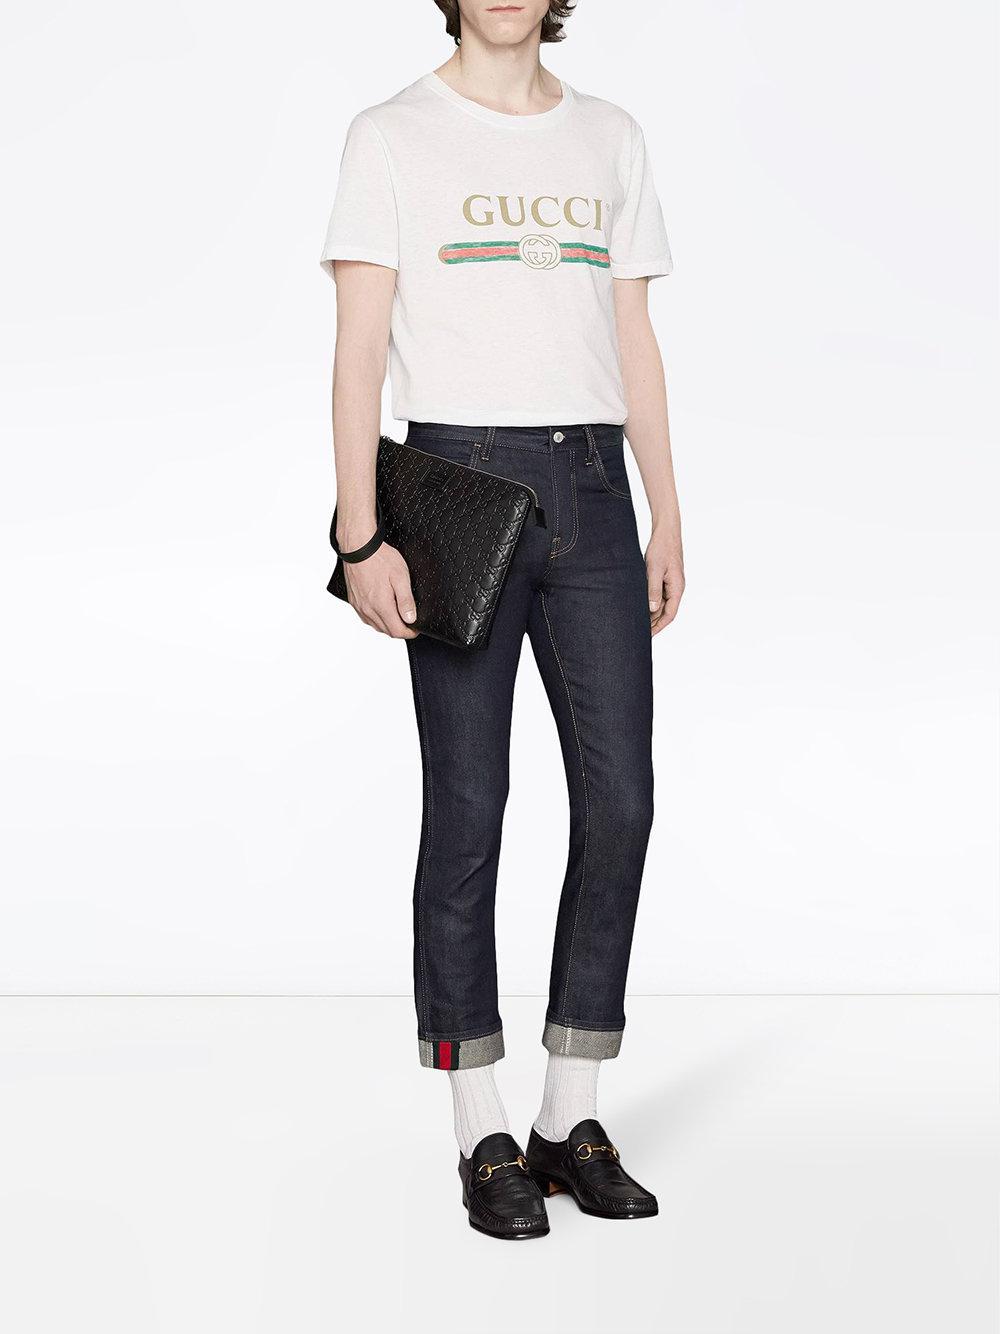 bc51550e3a5 Gucci Signature Soft Men s Bag in Black for Men - Lyst